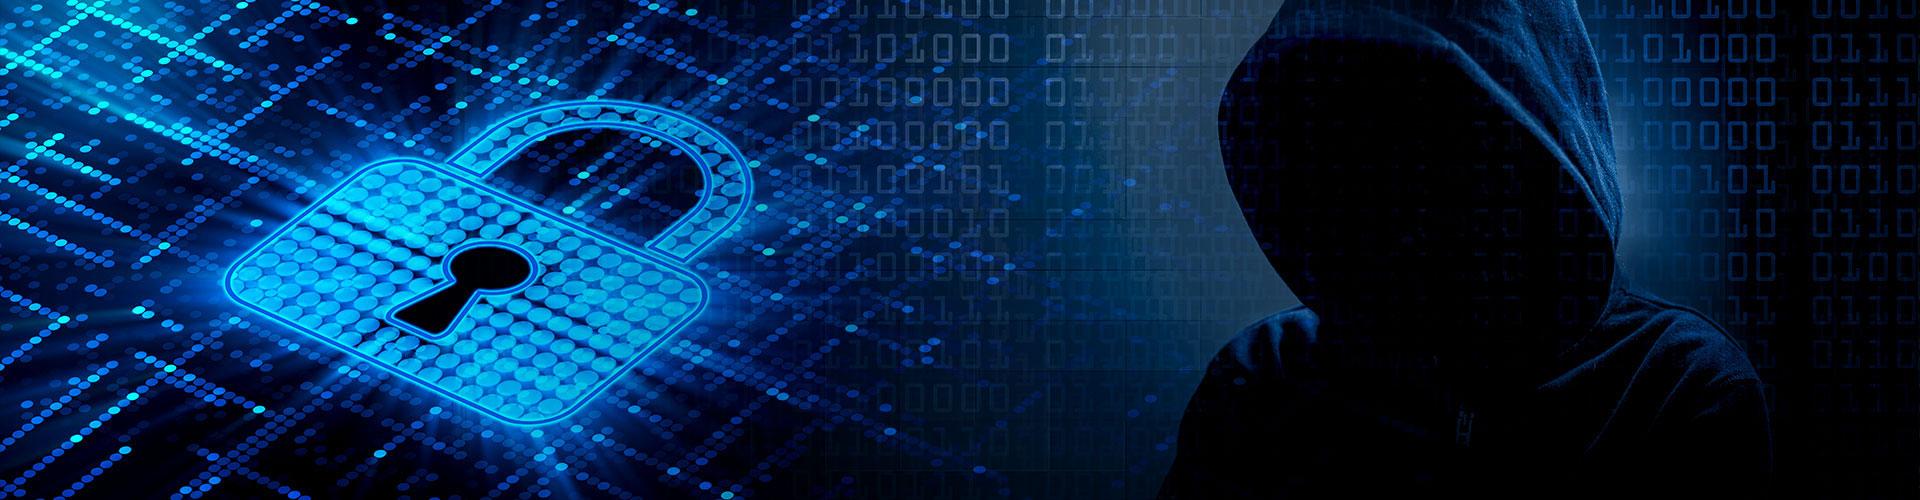 cybersecurity-banner-bg